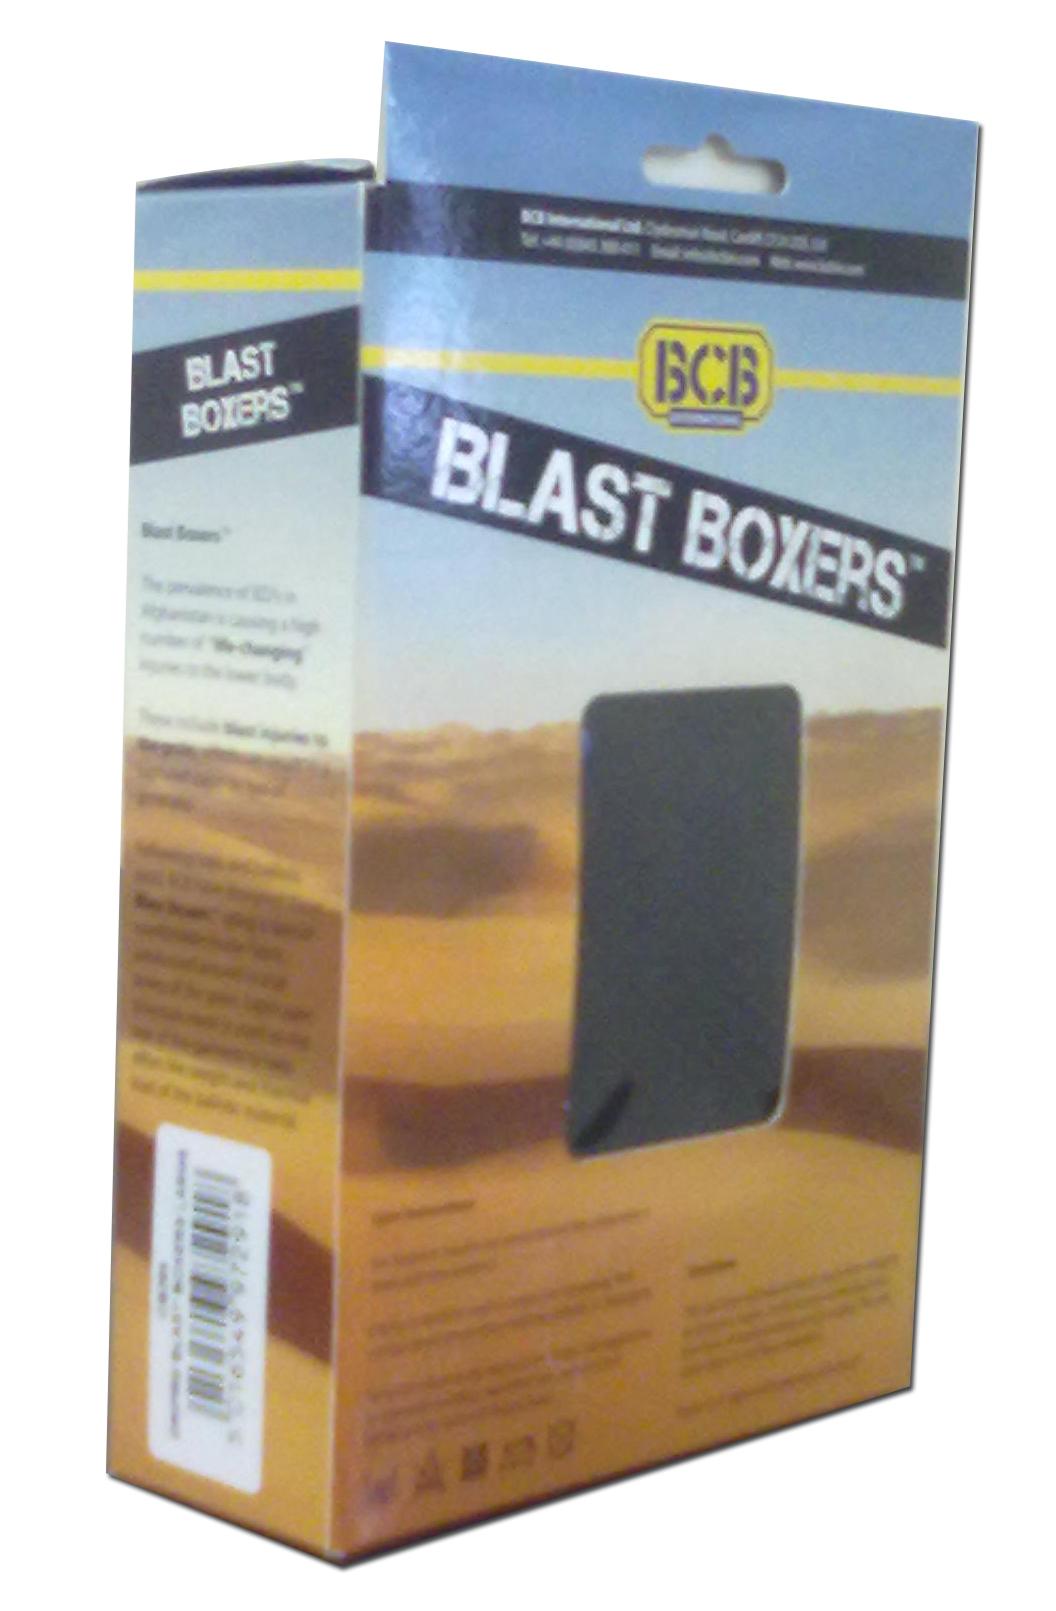 bcb-blast-boxer-package-back